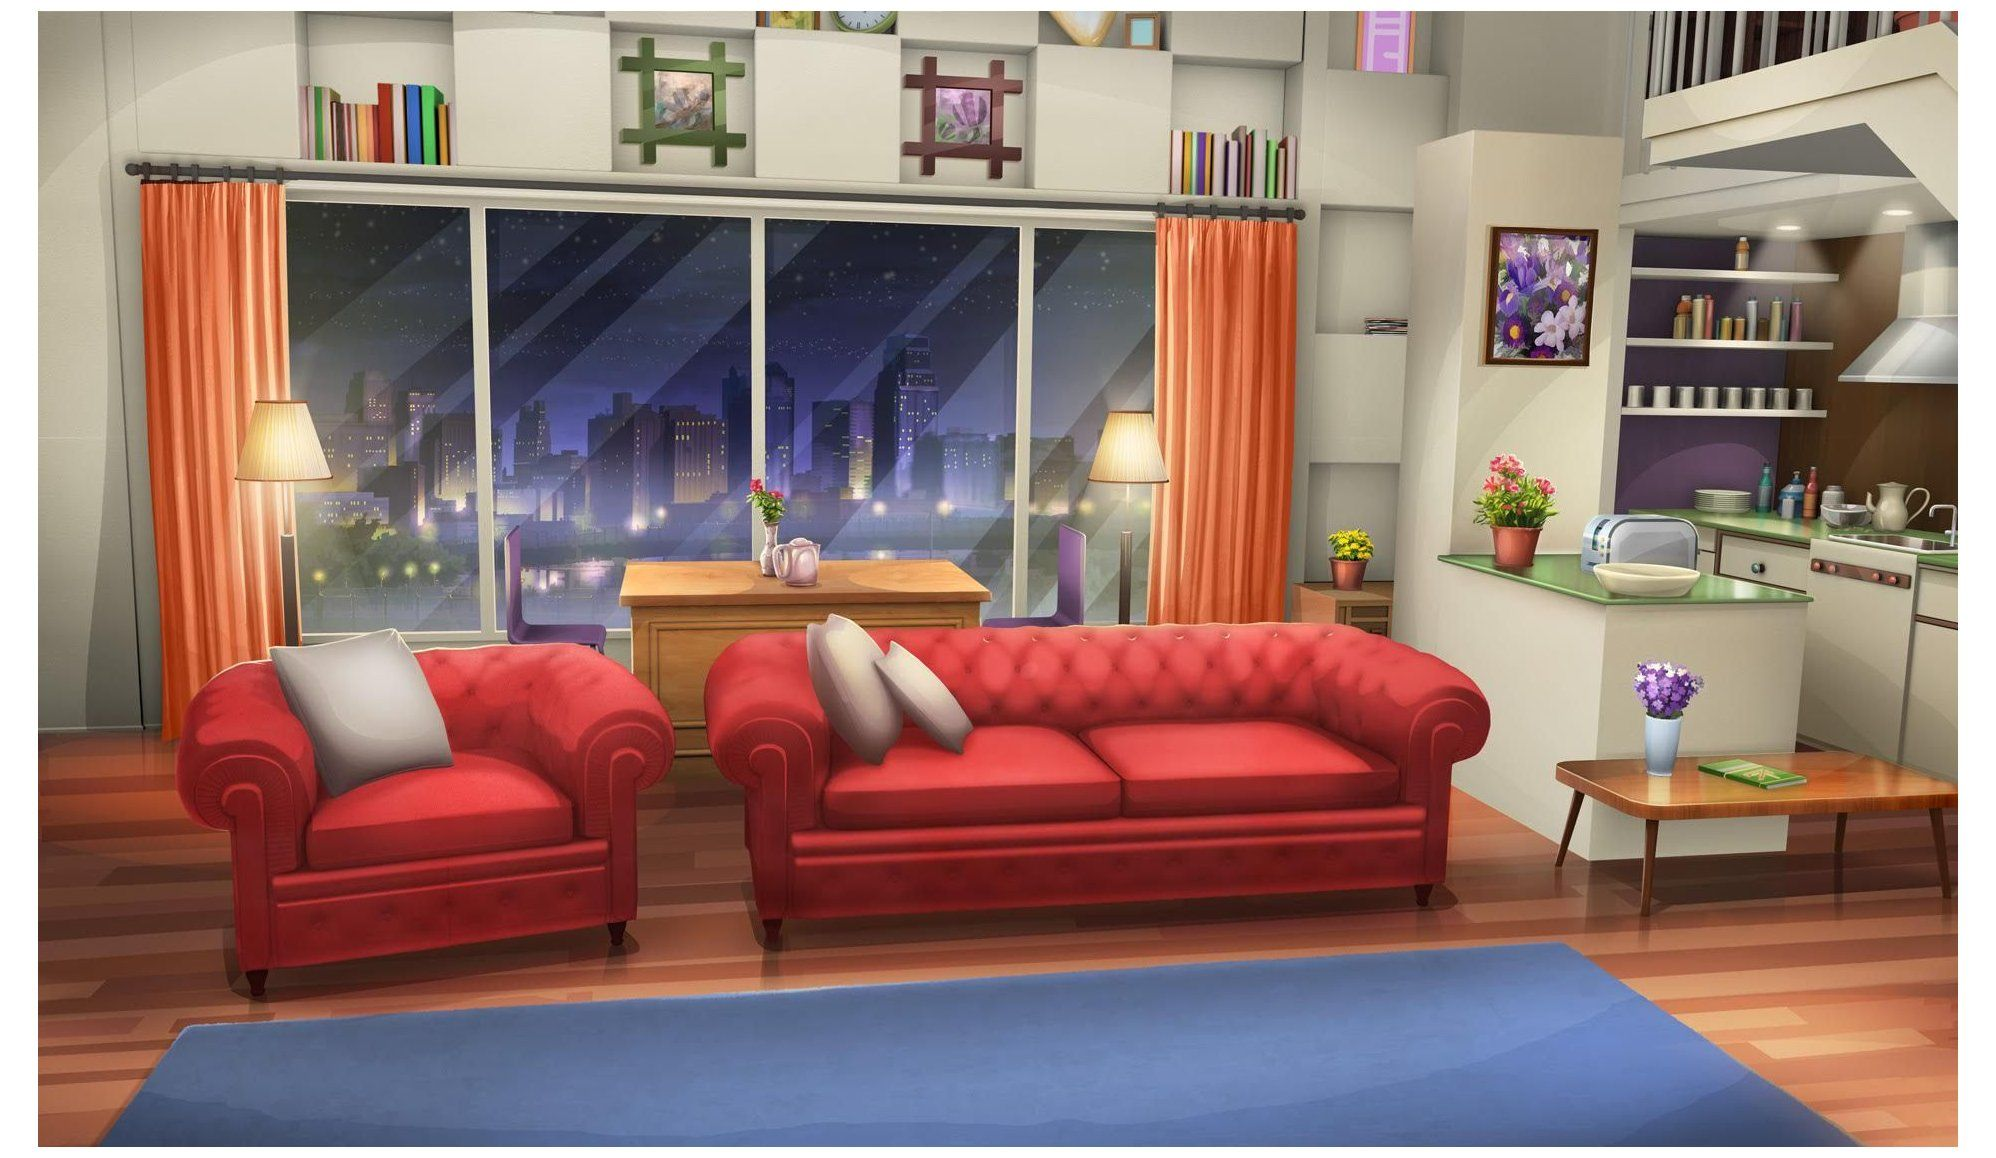 gacha life background living room